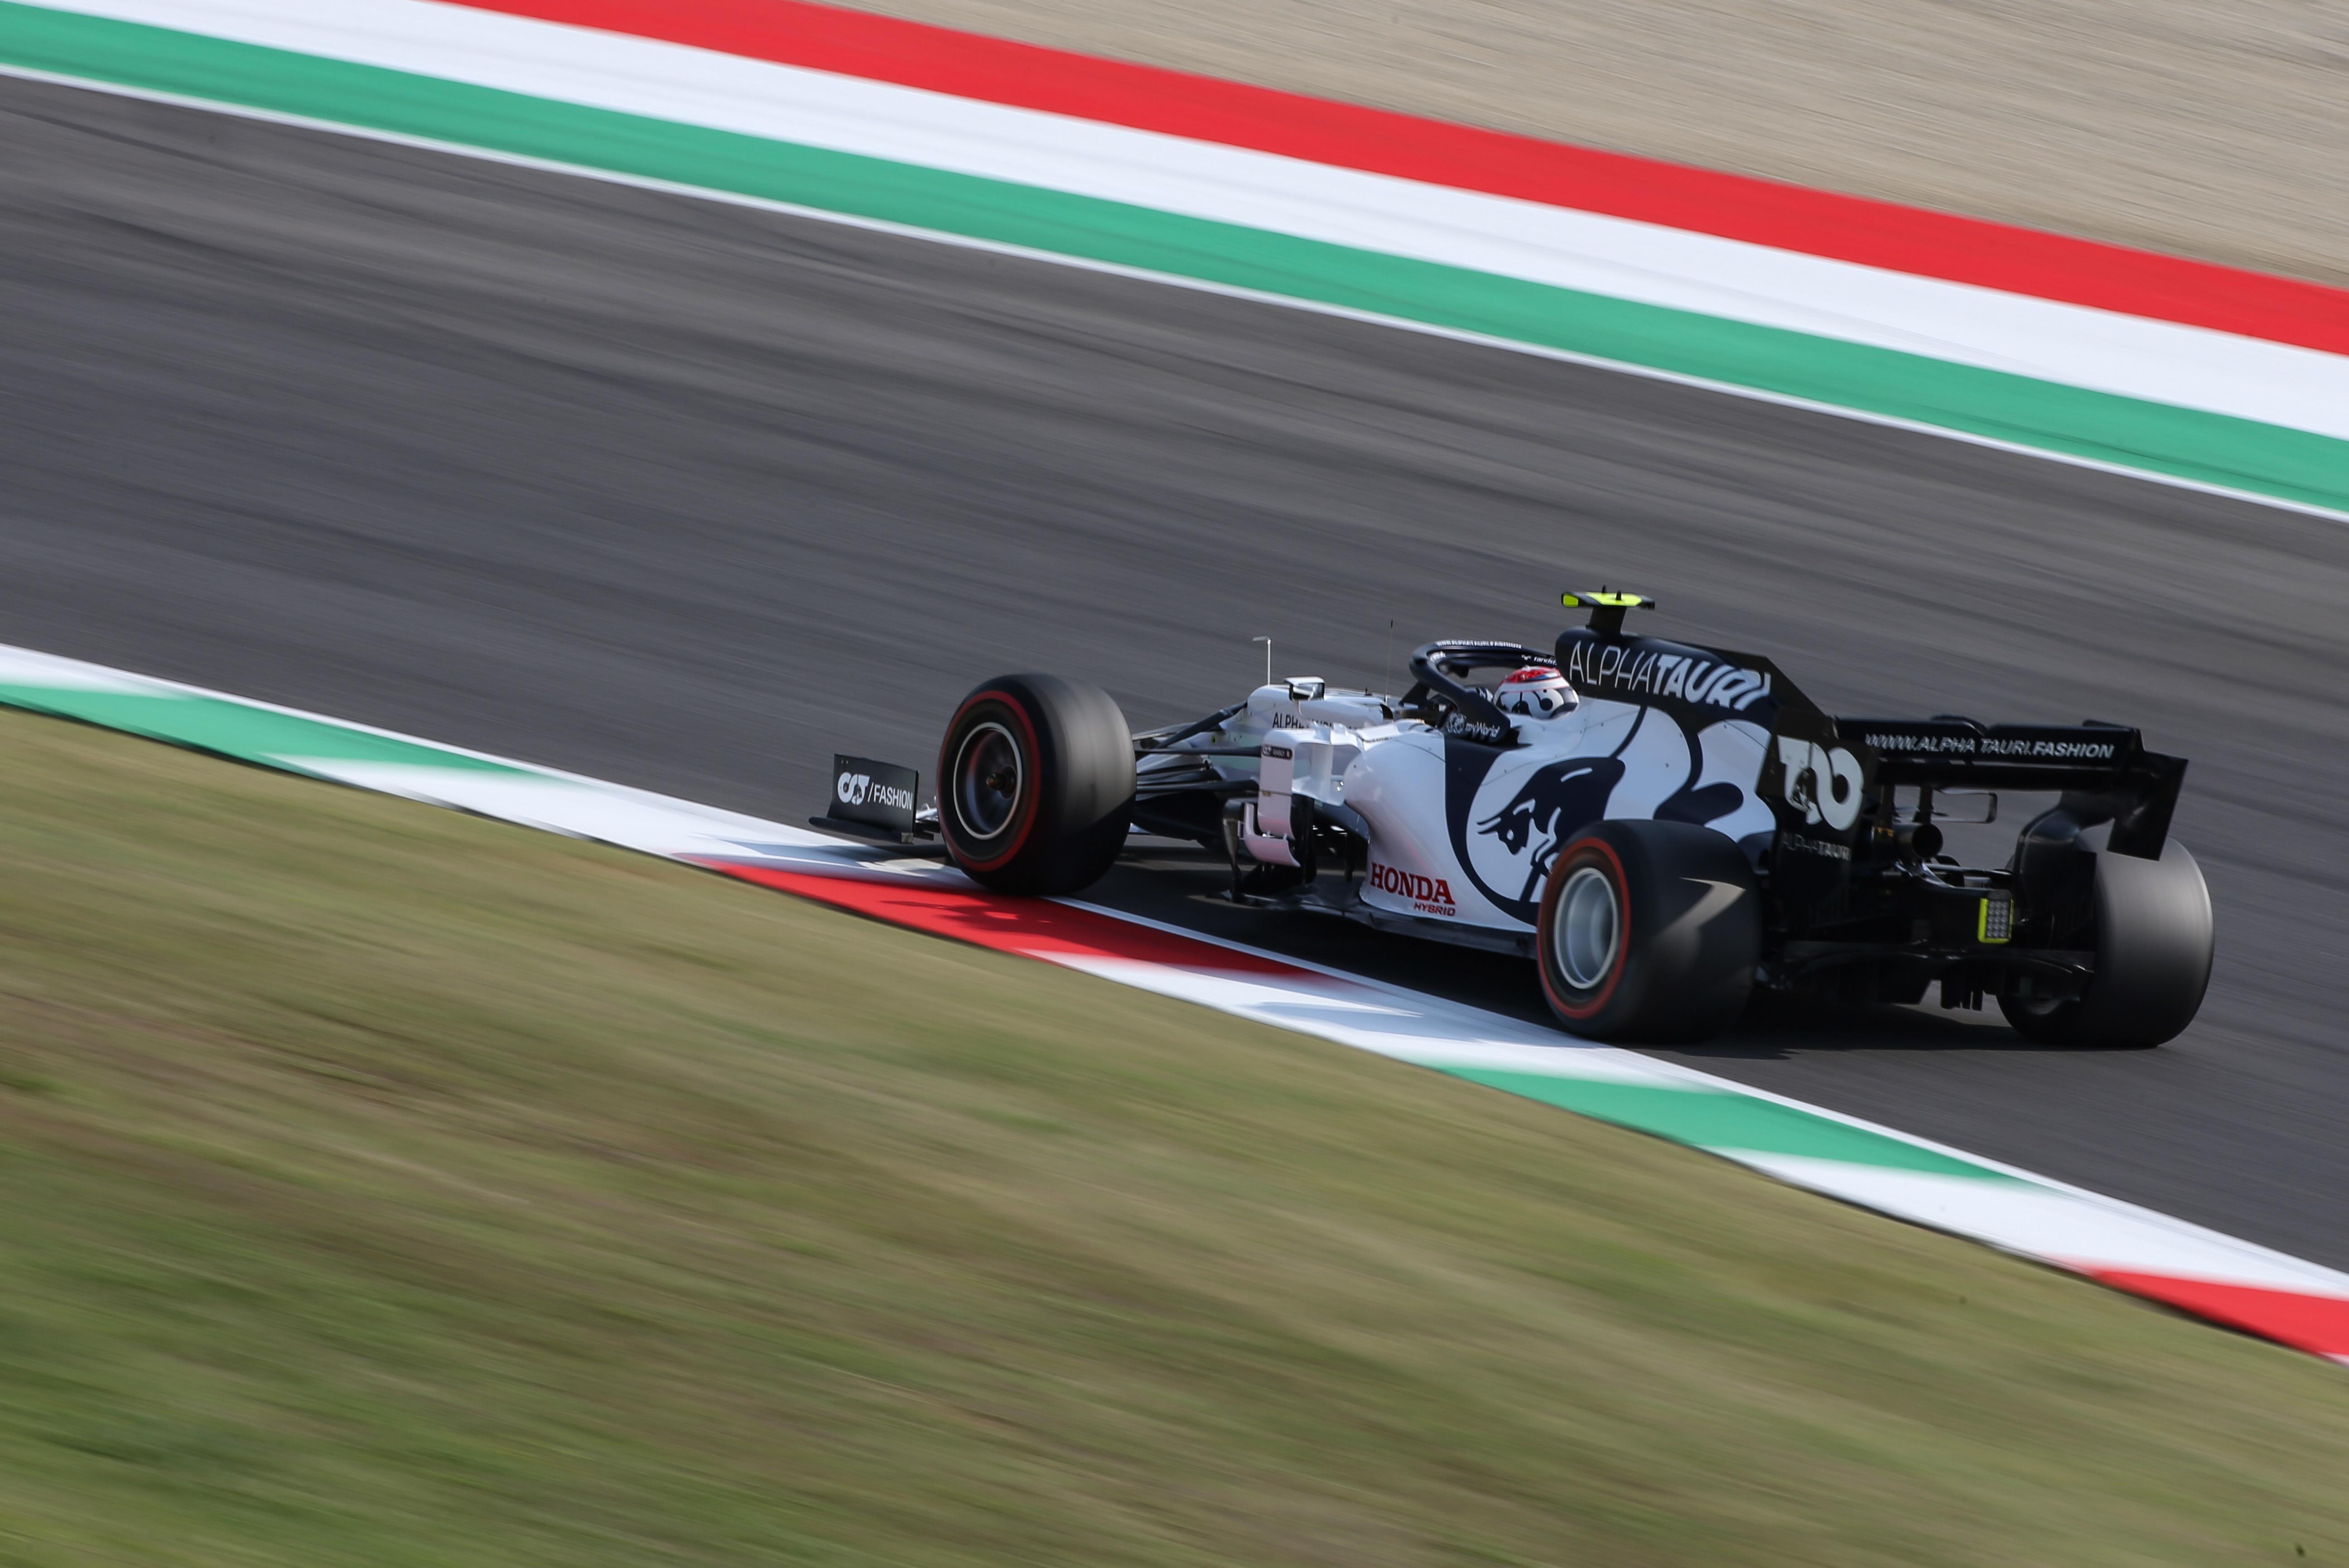 Motor Racing Formula One World Championship Tuscan Grand Prix Practice Day Mugello, Italy